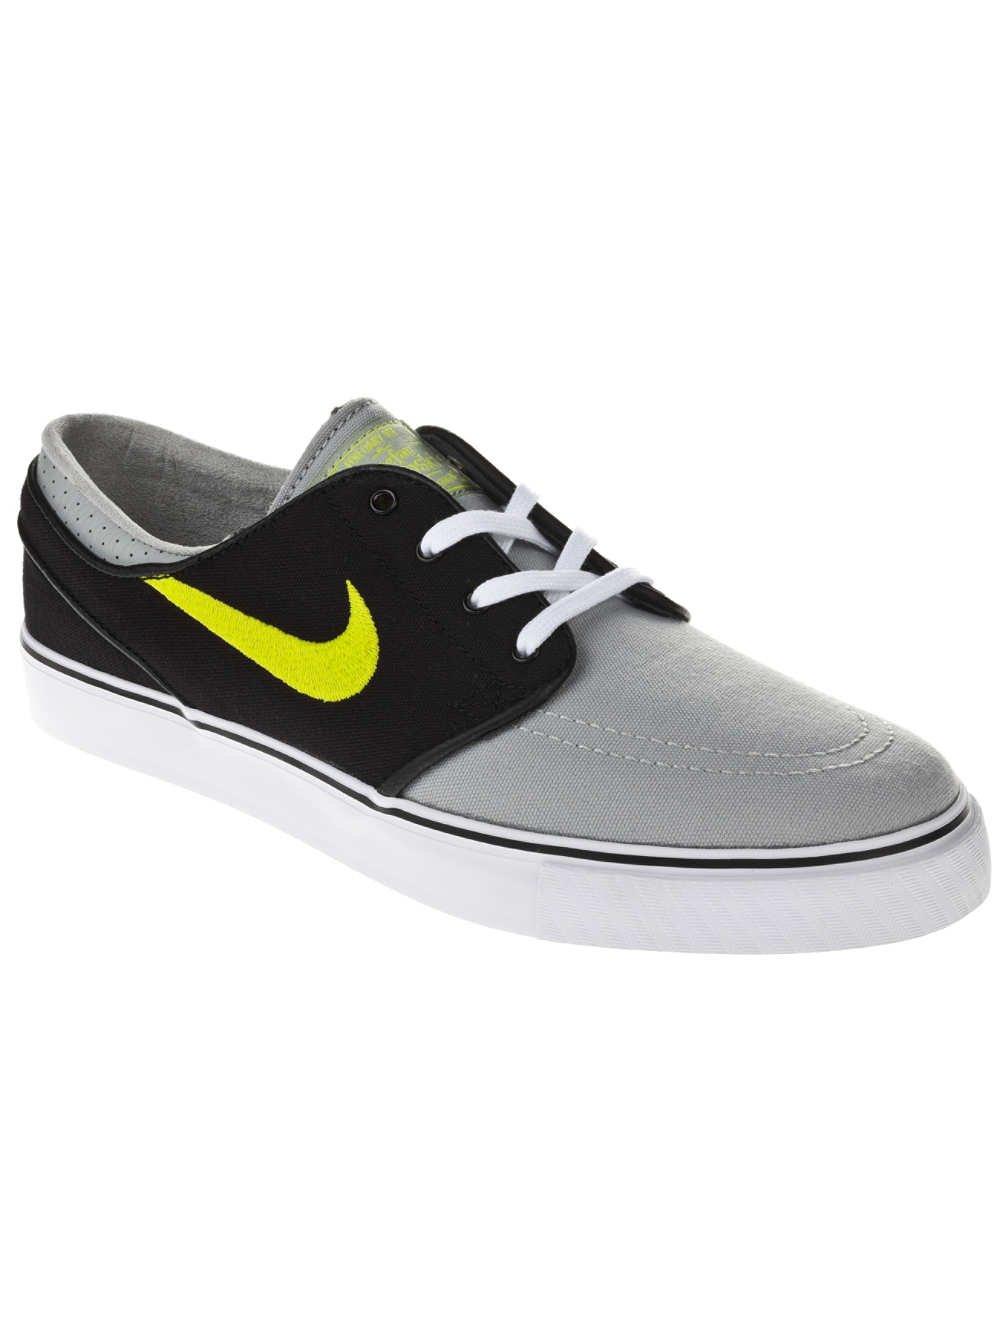 Servicio top Zapatillas – Zoom Grisnegroverde Stefan Canvas Durable 43 El Nbyshop Nike Janoski shQrdt